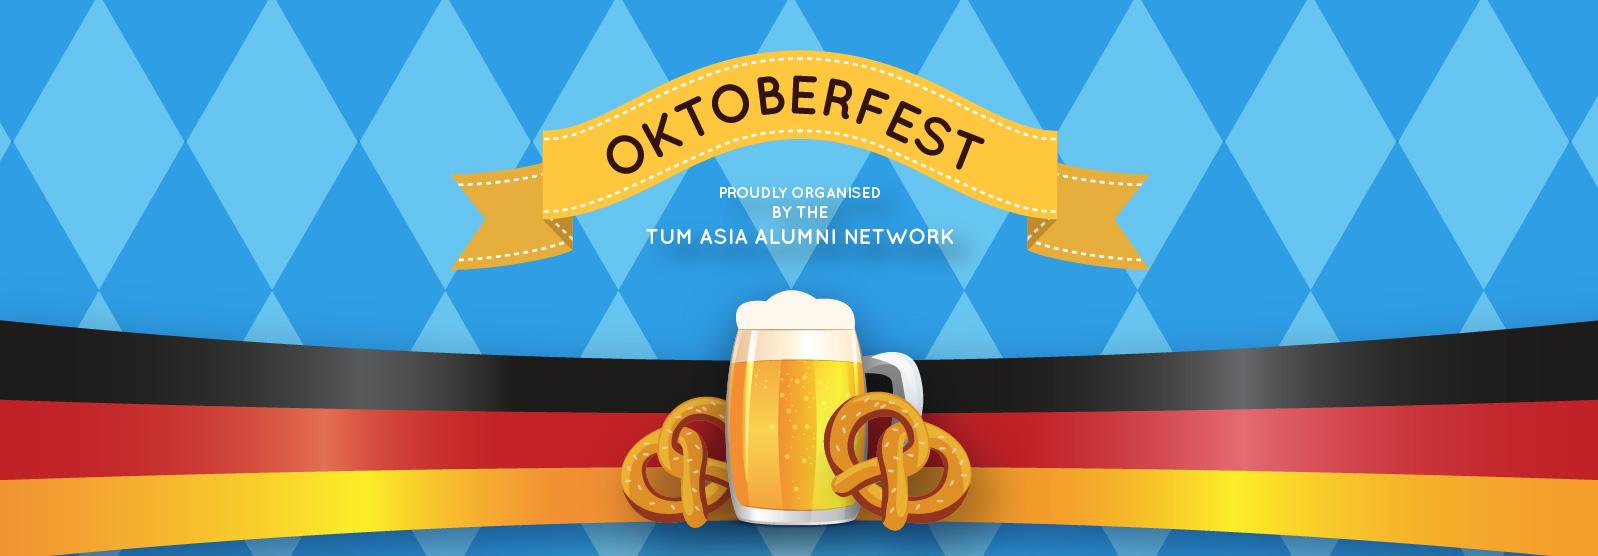 oktoberfest_banner-02